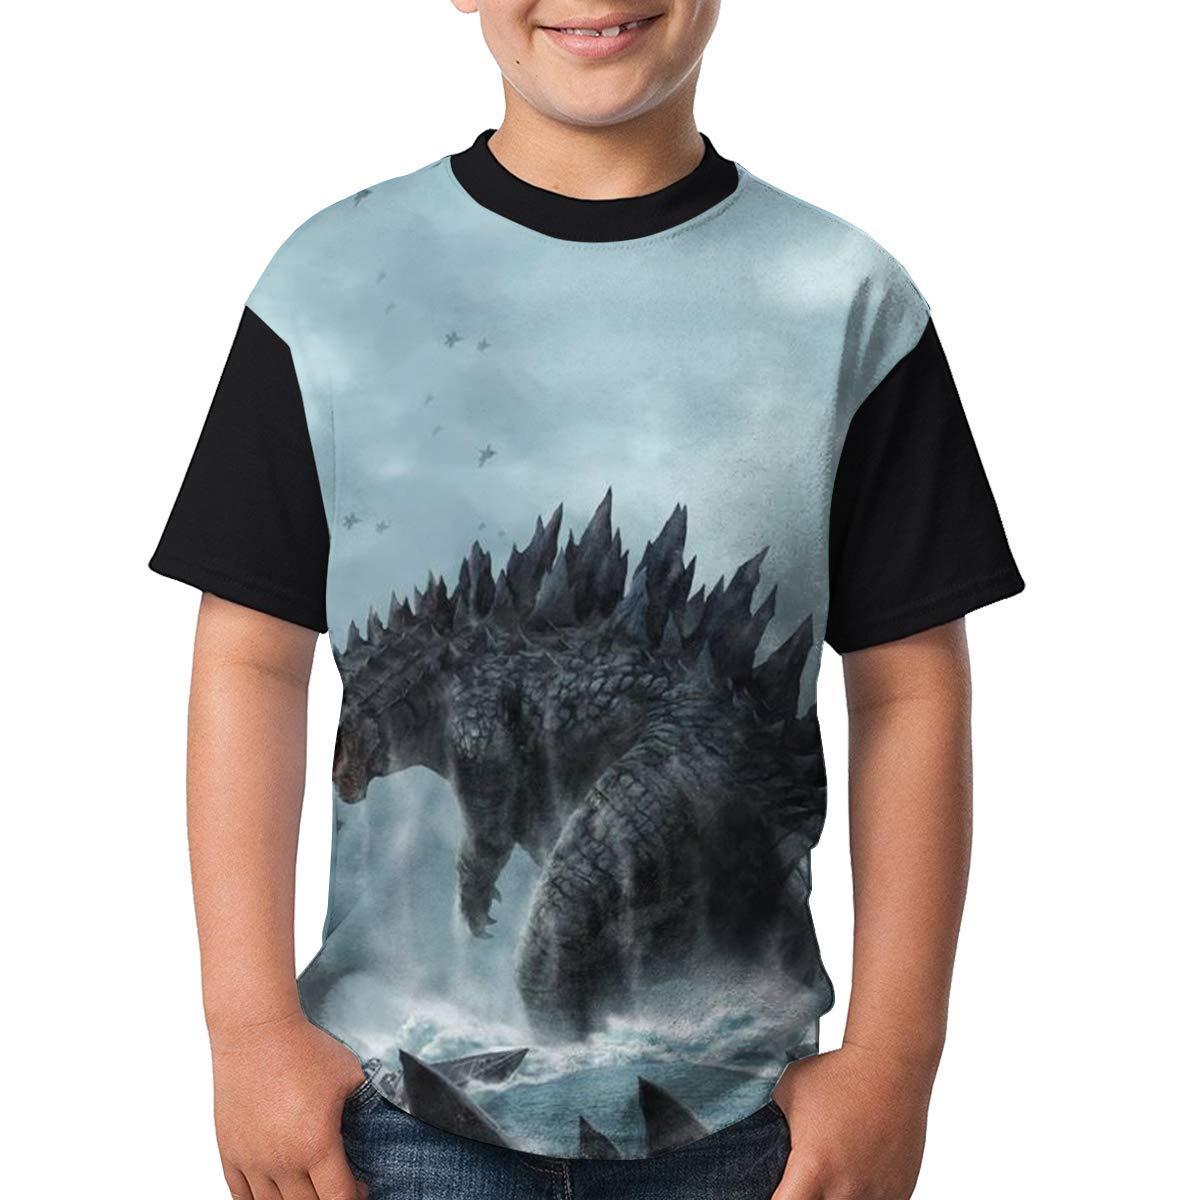 Godzilla-King Unisex Kids Short Sleeve T-Shirt Crew Neck Original Design Tee Shirt Tops